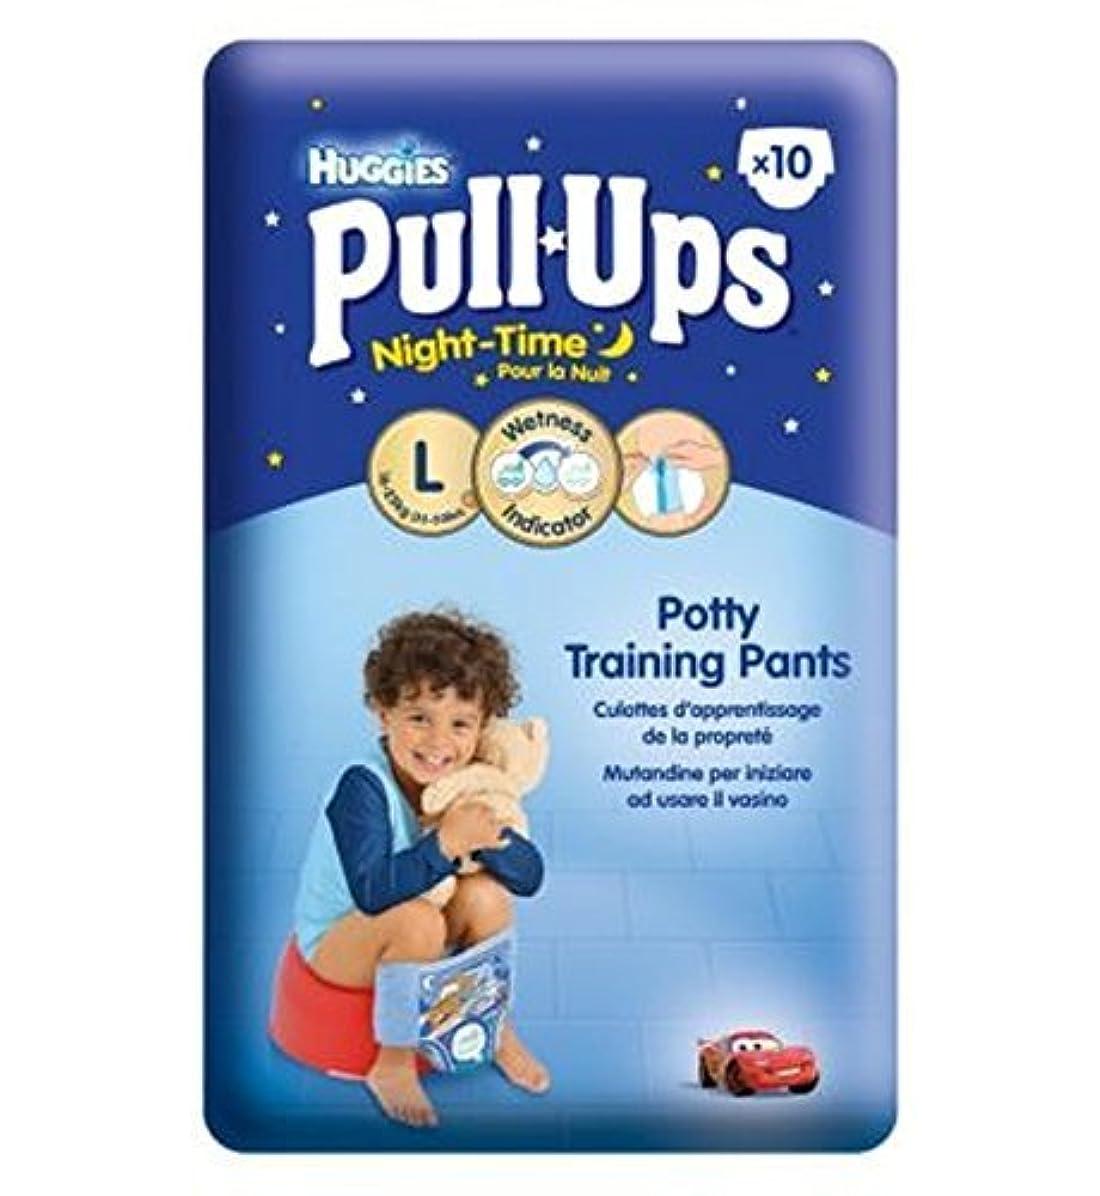 Huggies? Pull-Ups? Disney-Pixar Cars Night-Time Boys Size 6 Potty Training Pants - 1 x 10 Potty Training Pants...